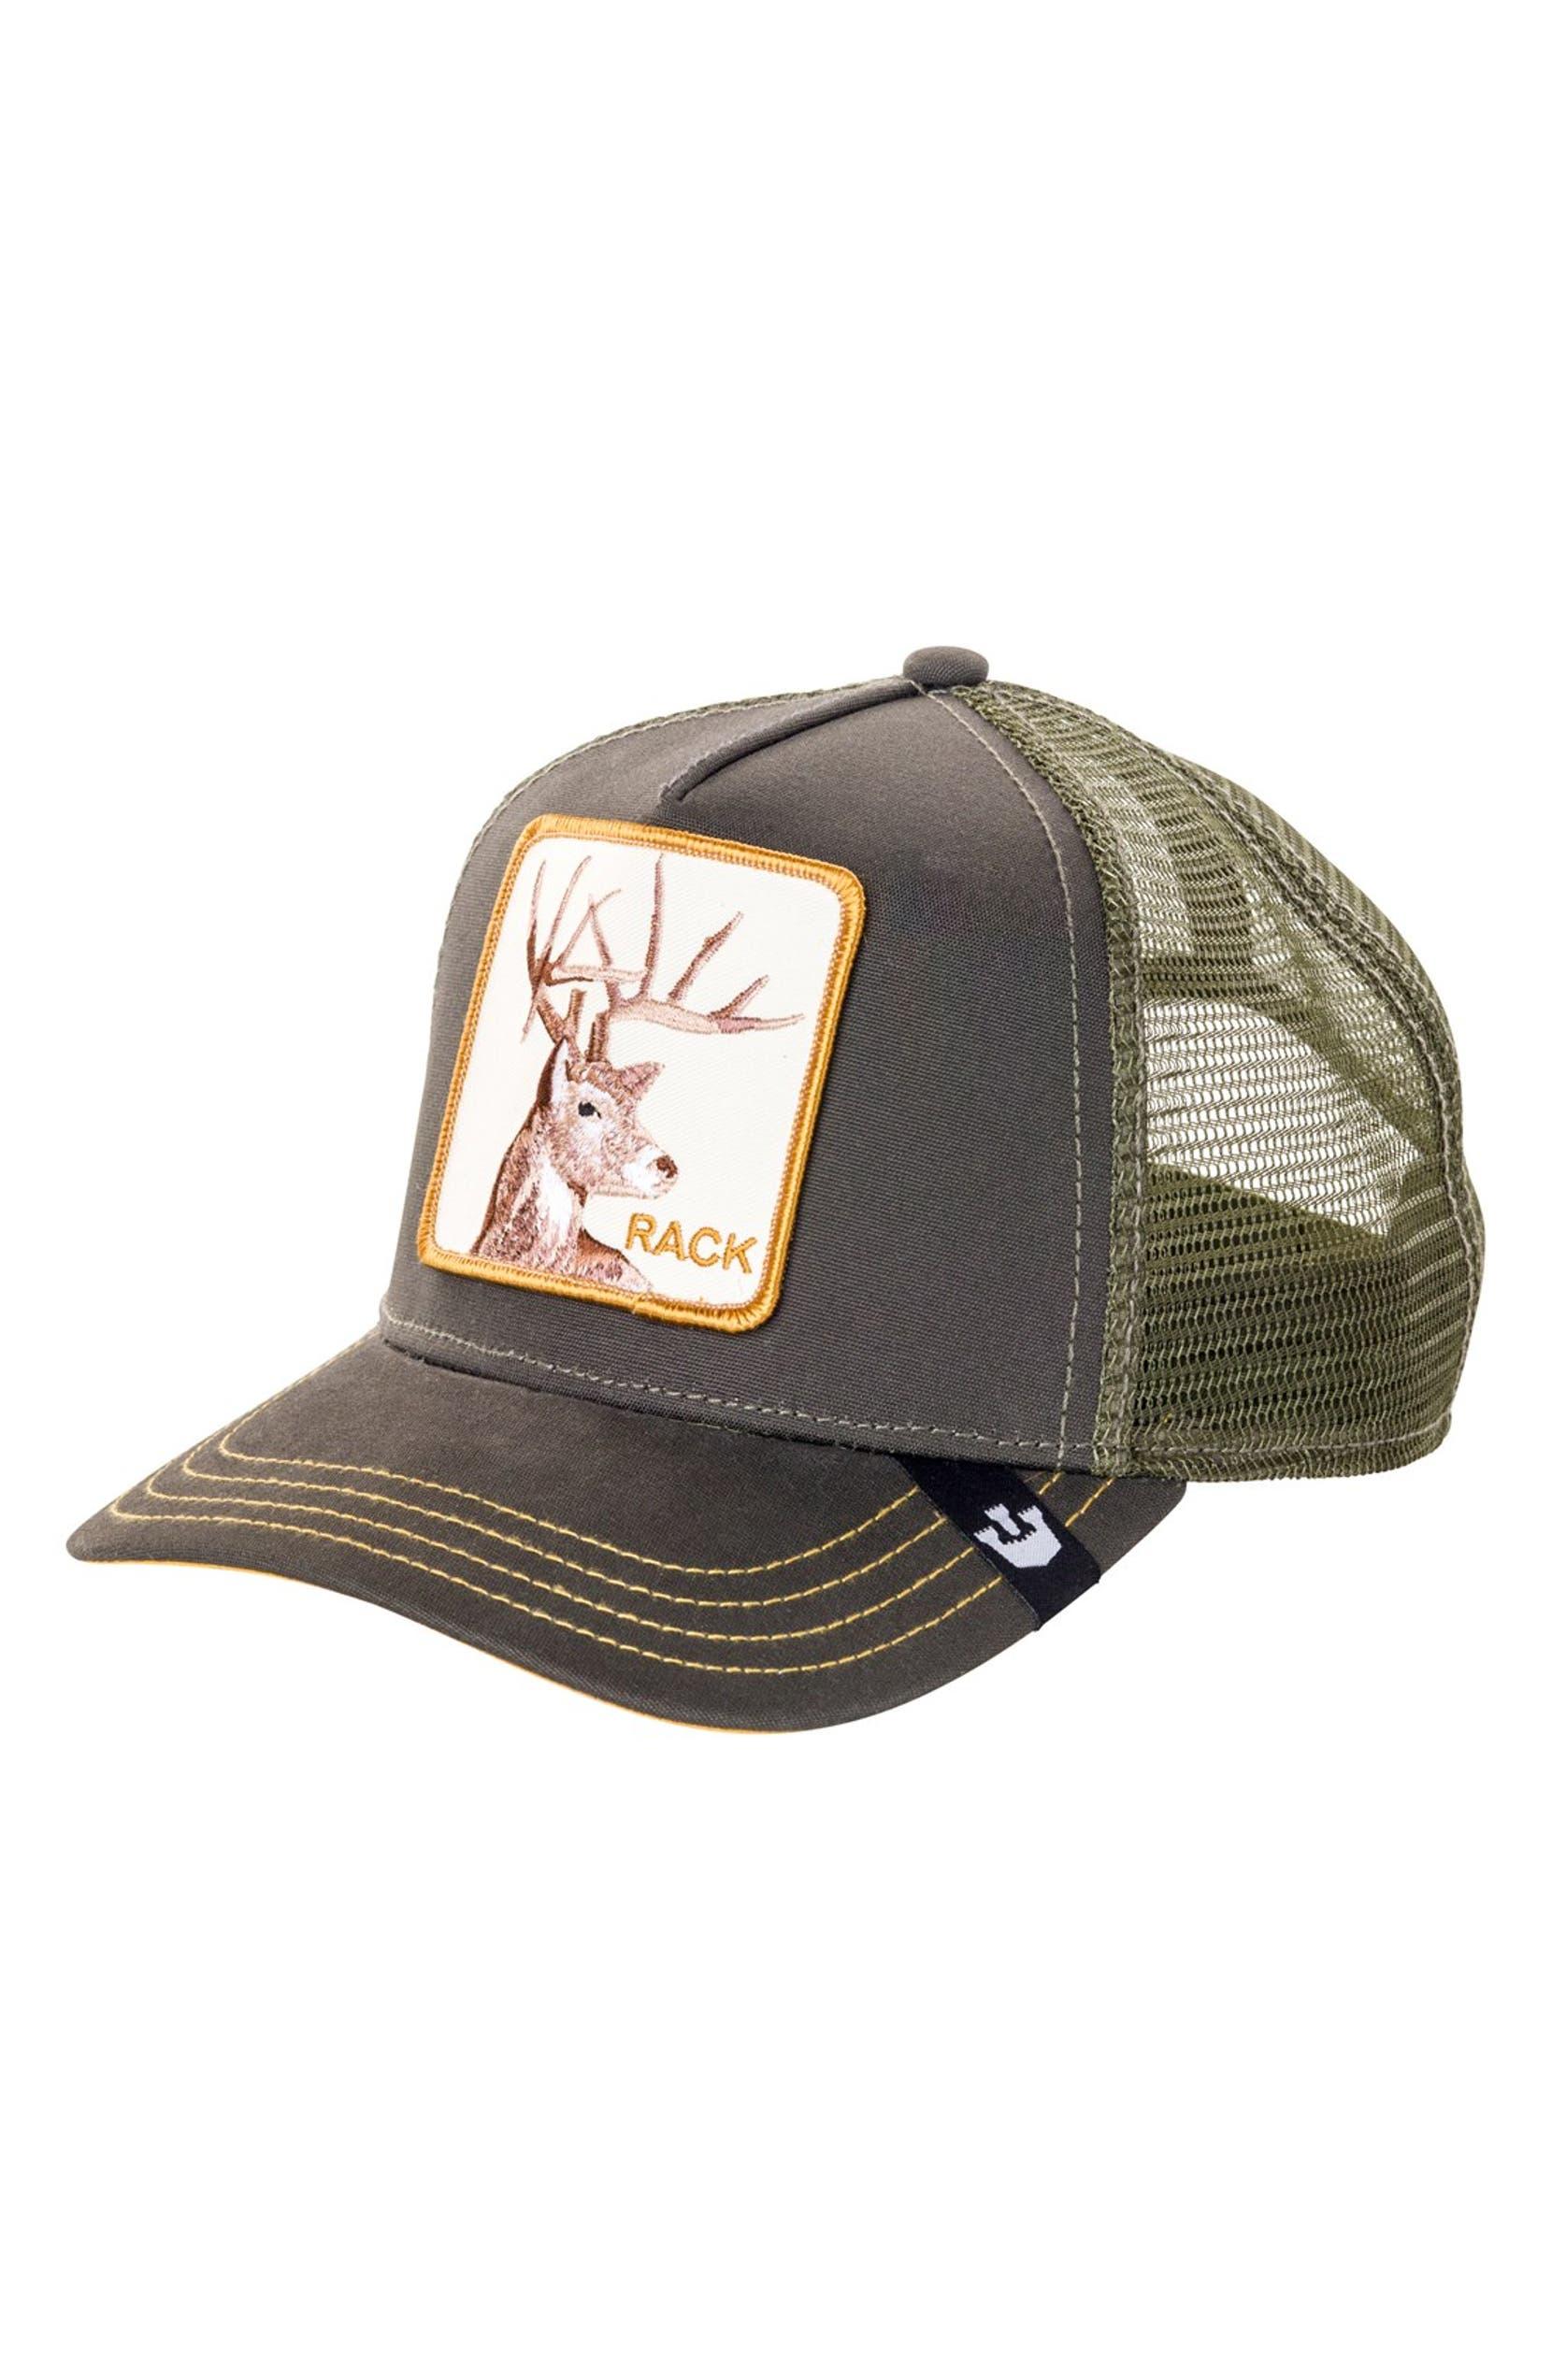 Goorin Brothers  Animal Farm - Rack  Trucker Hat  16daa68e6fa